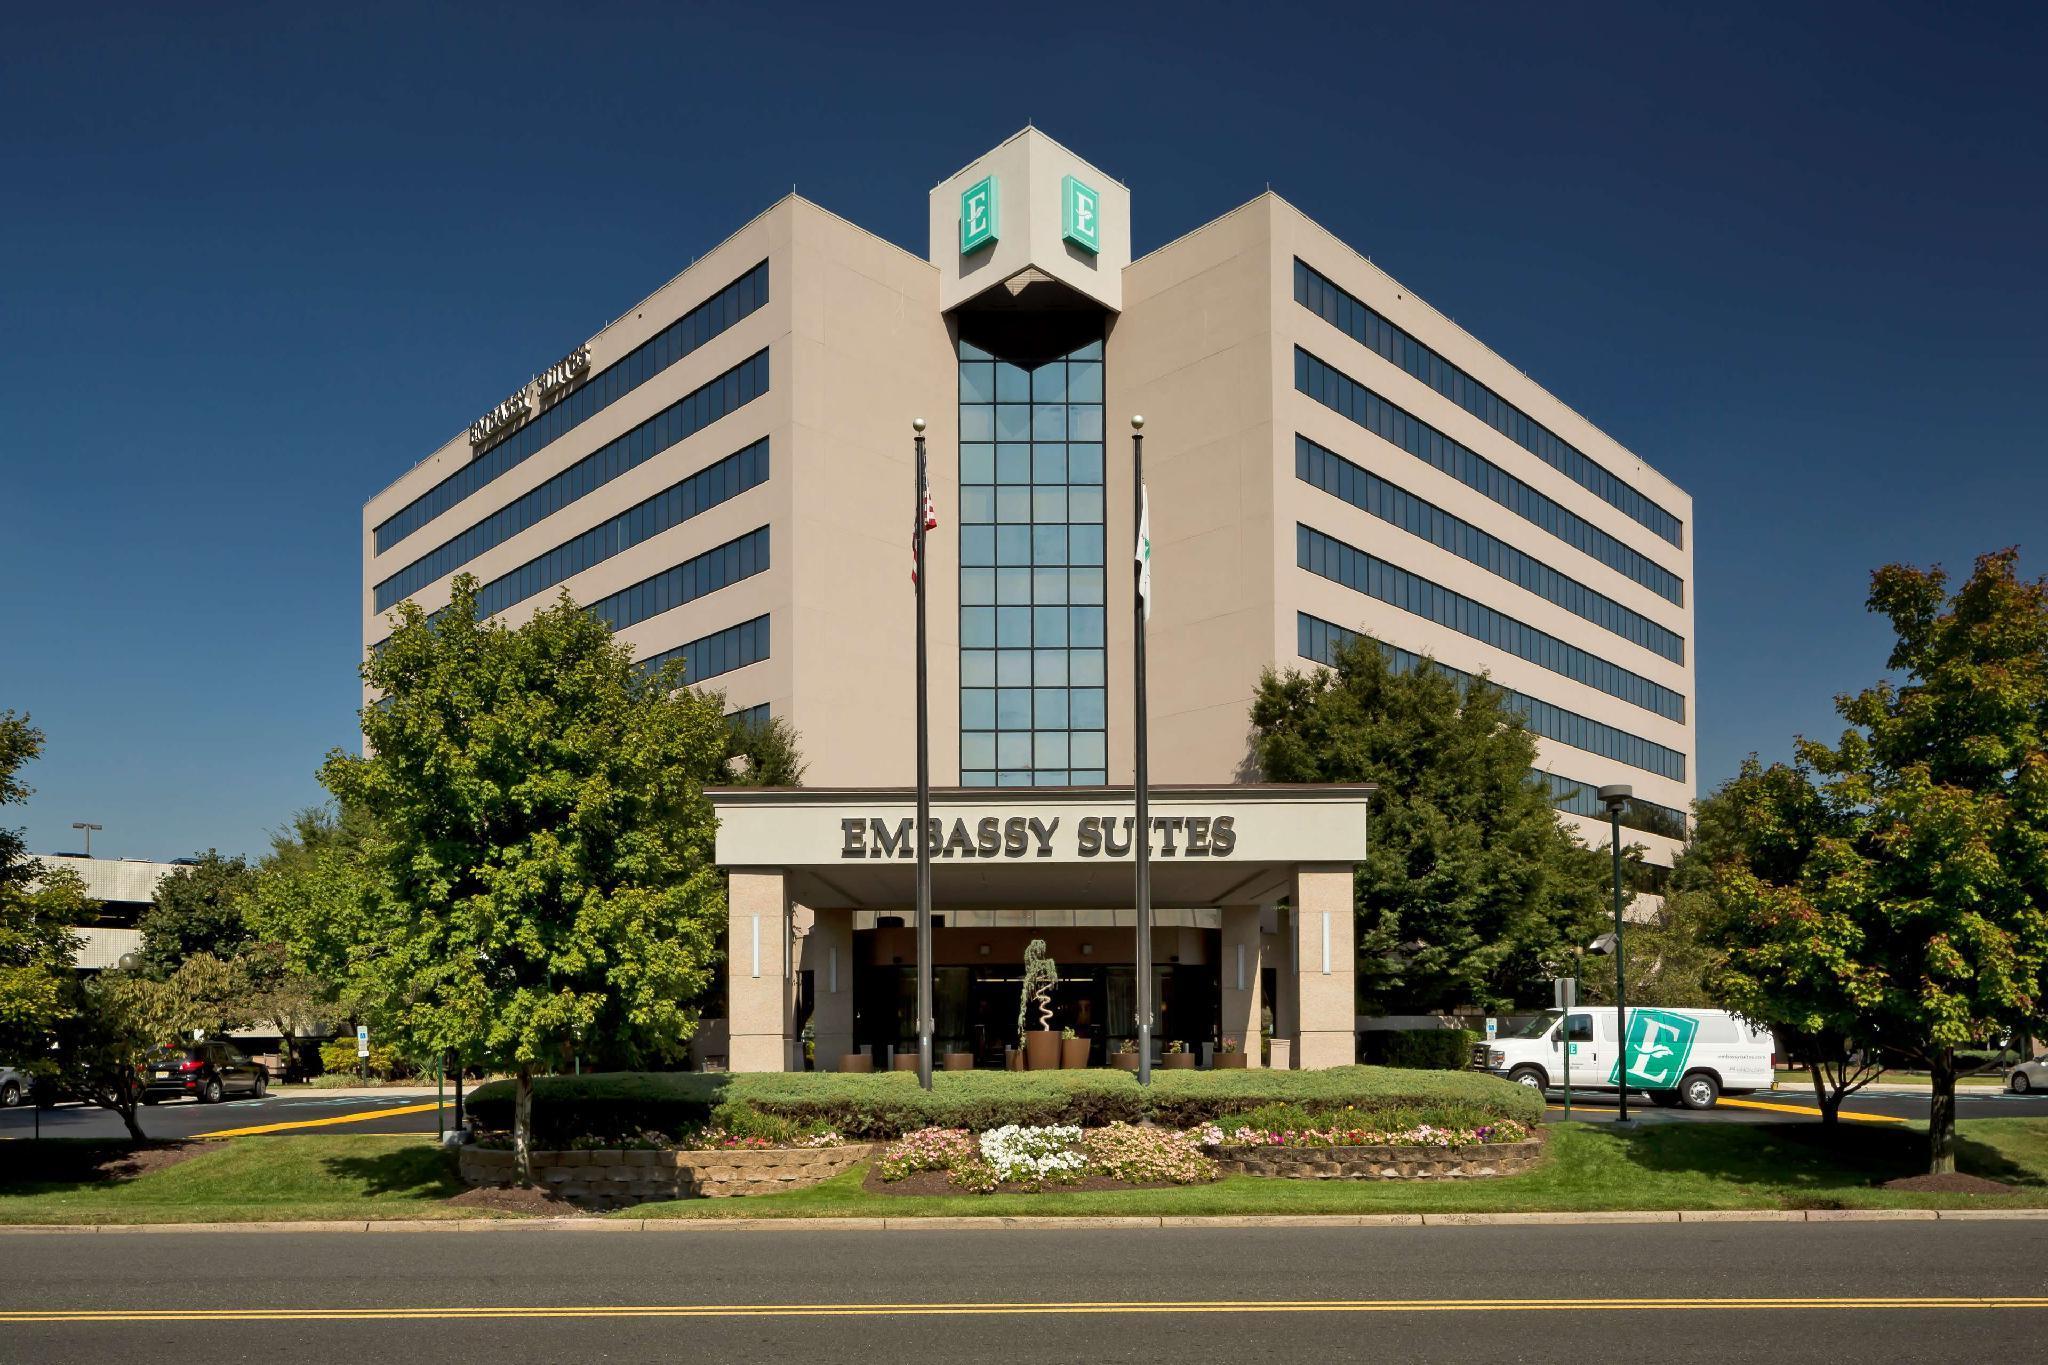 Embassy Suites Secaucus Meadowlands Hotel